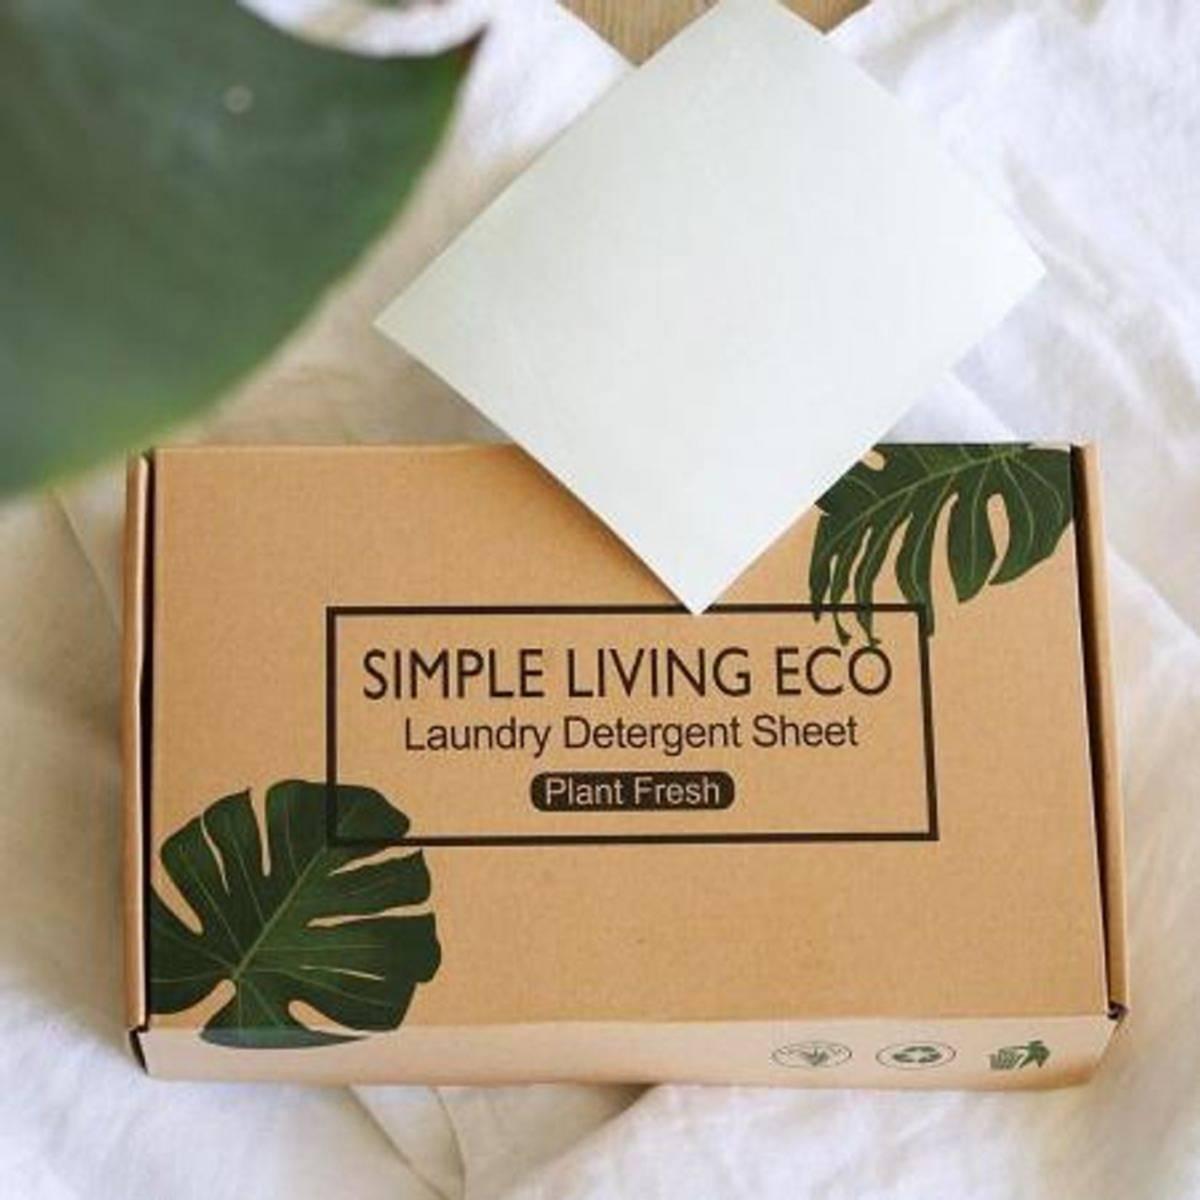 60stk vaskeark, Plant Fresh / Simple Living Eco